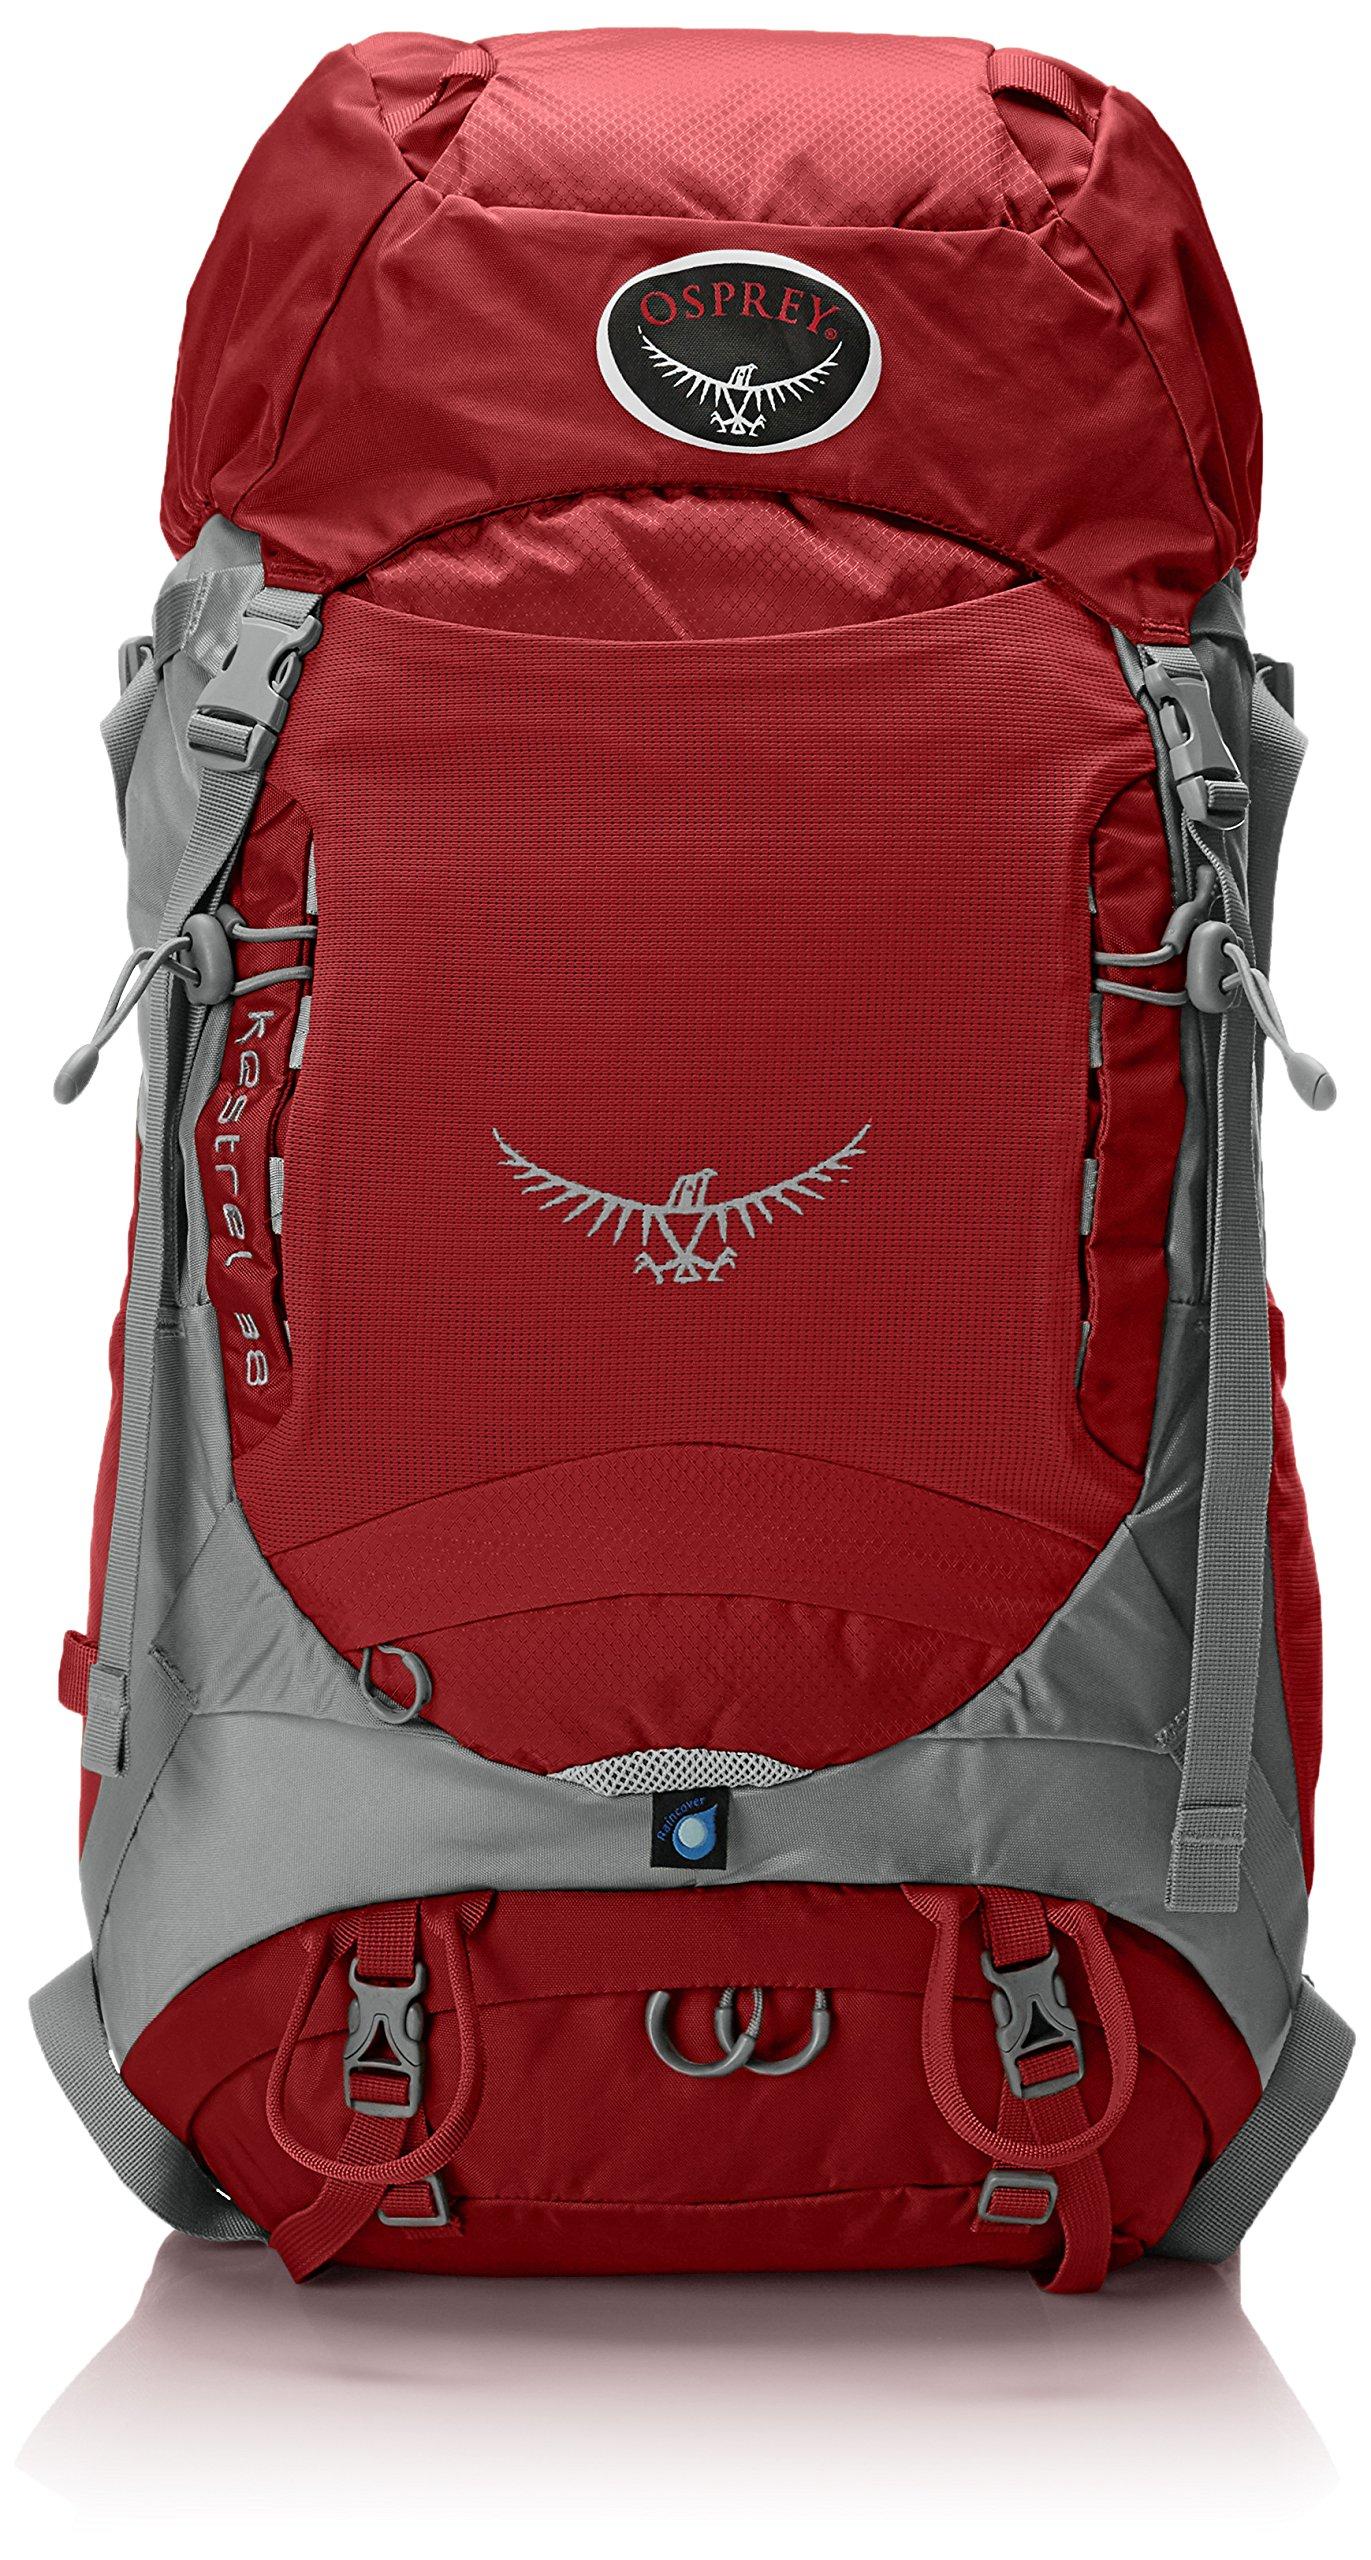 Osprey Packs Kestrel 38 Backpack (2015 Model) (Fire Red, Medium/Large)